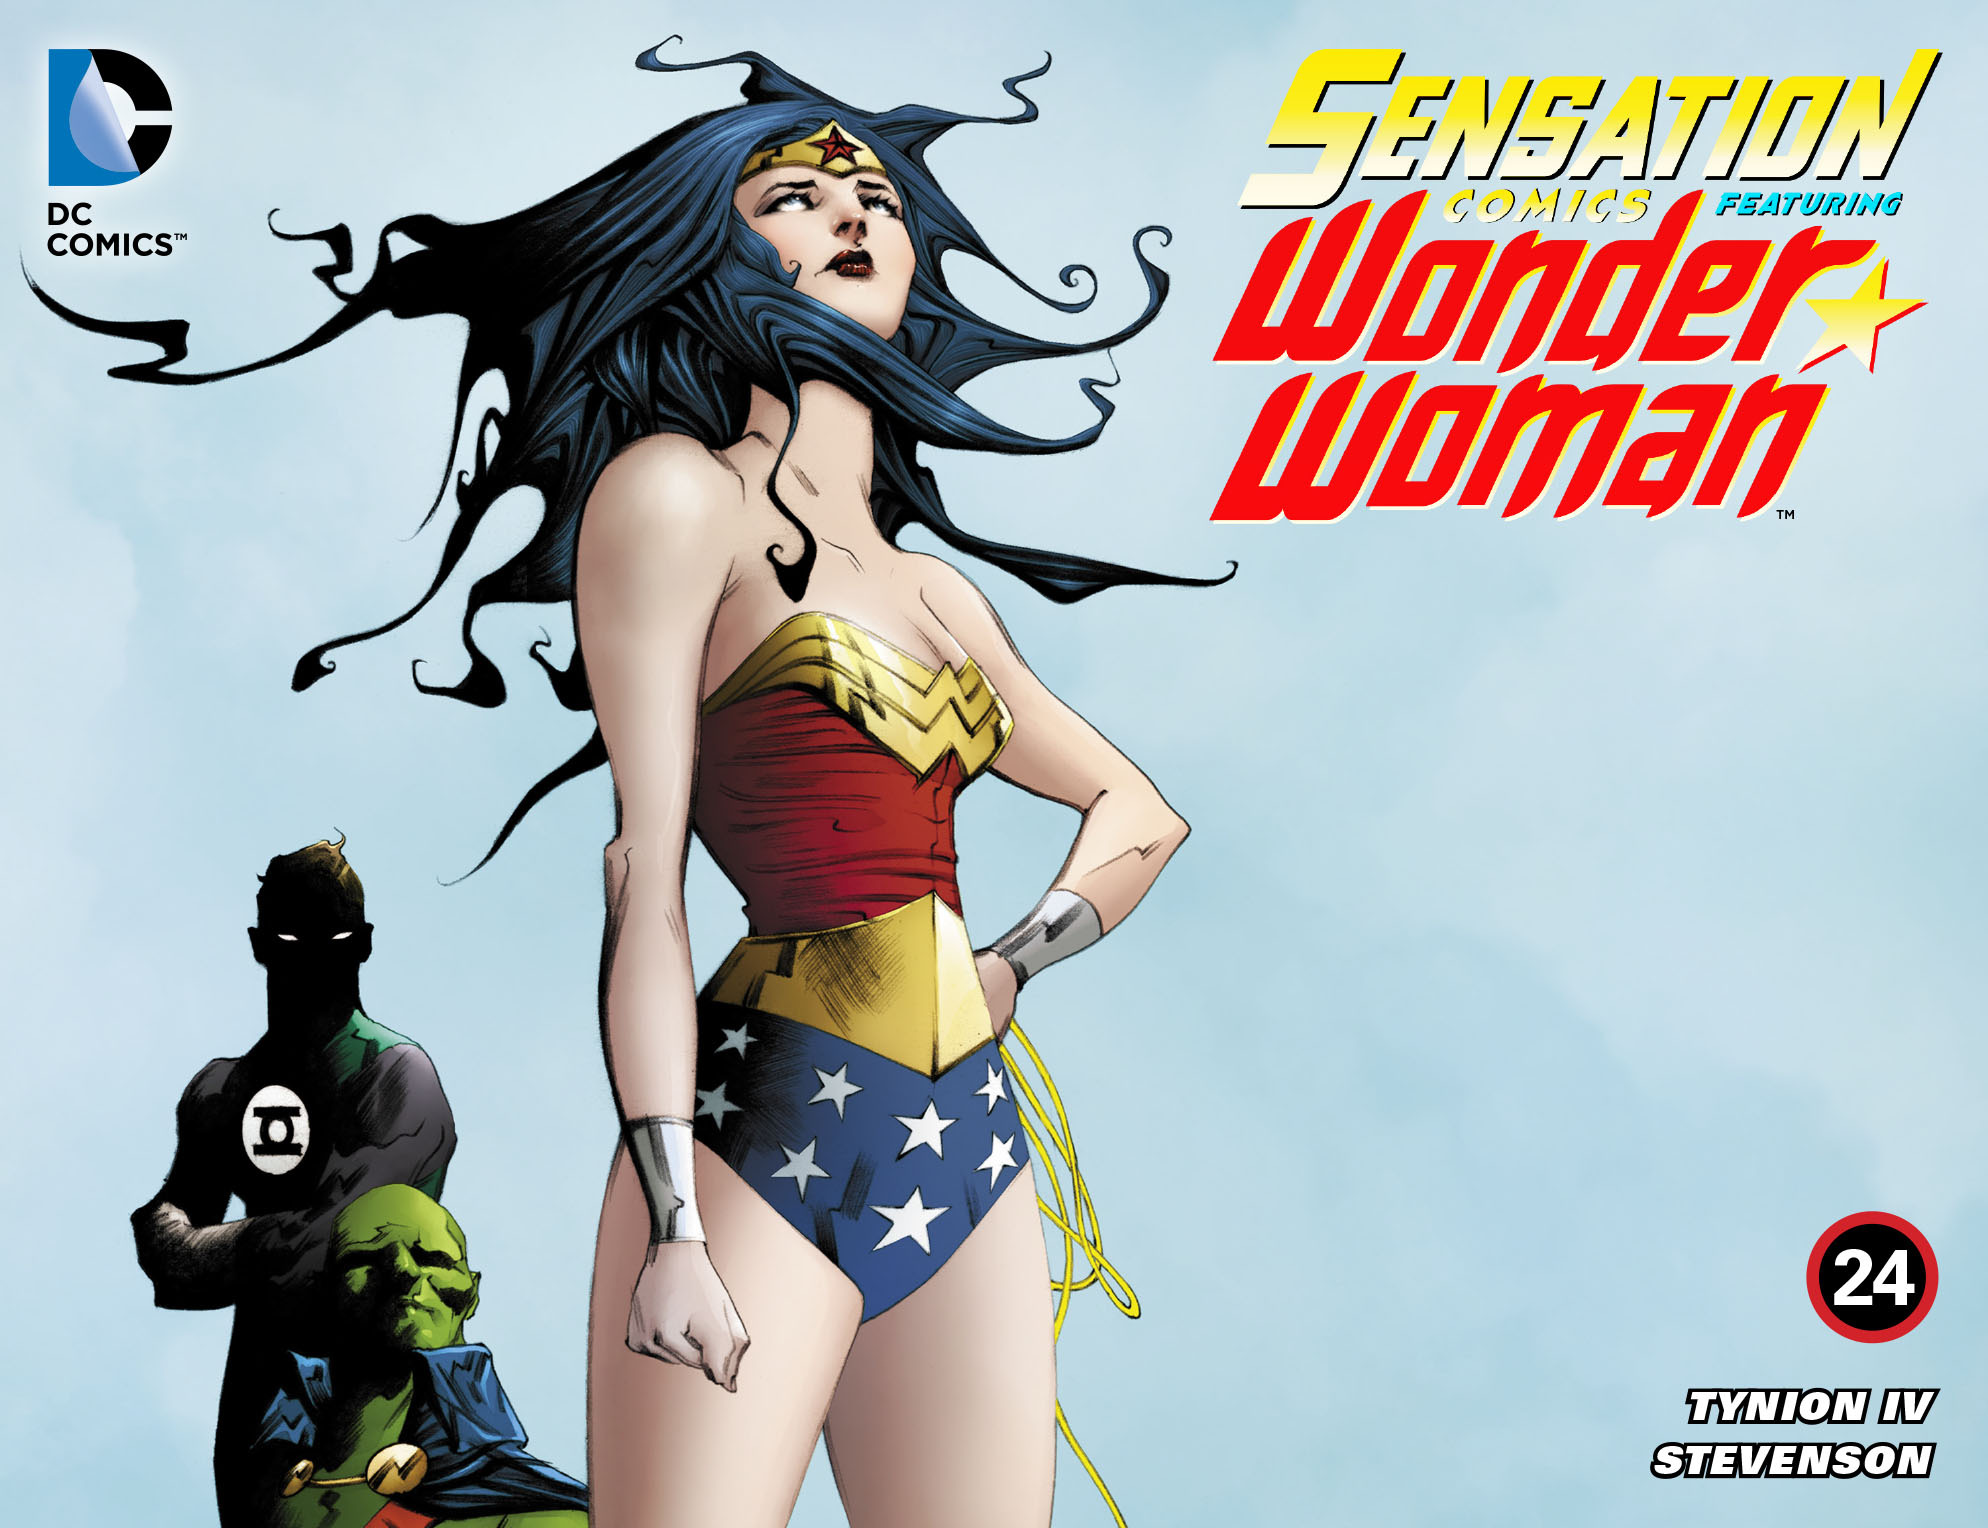 Read online Sensation Comics Featuring Wonder Woman comic -  Issue #24 - 1